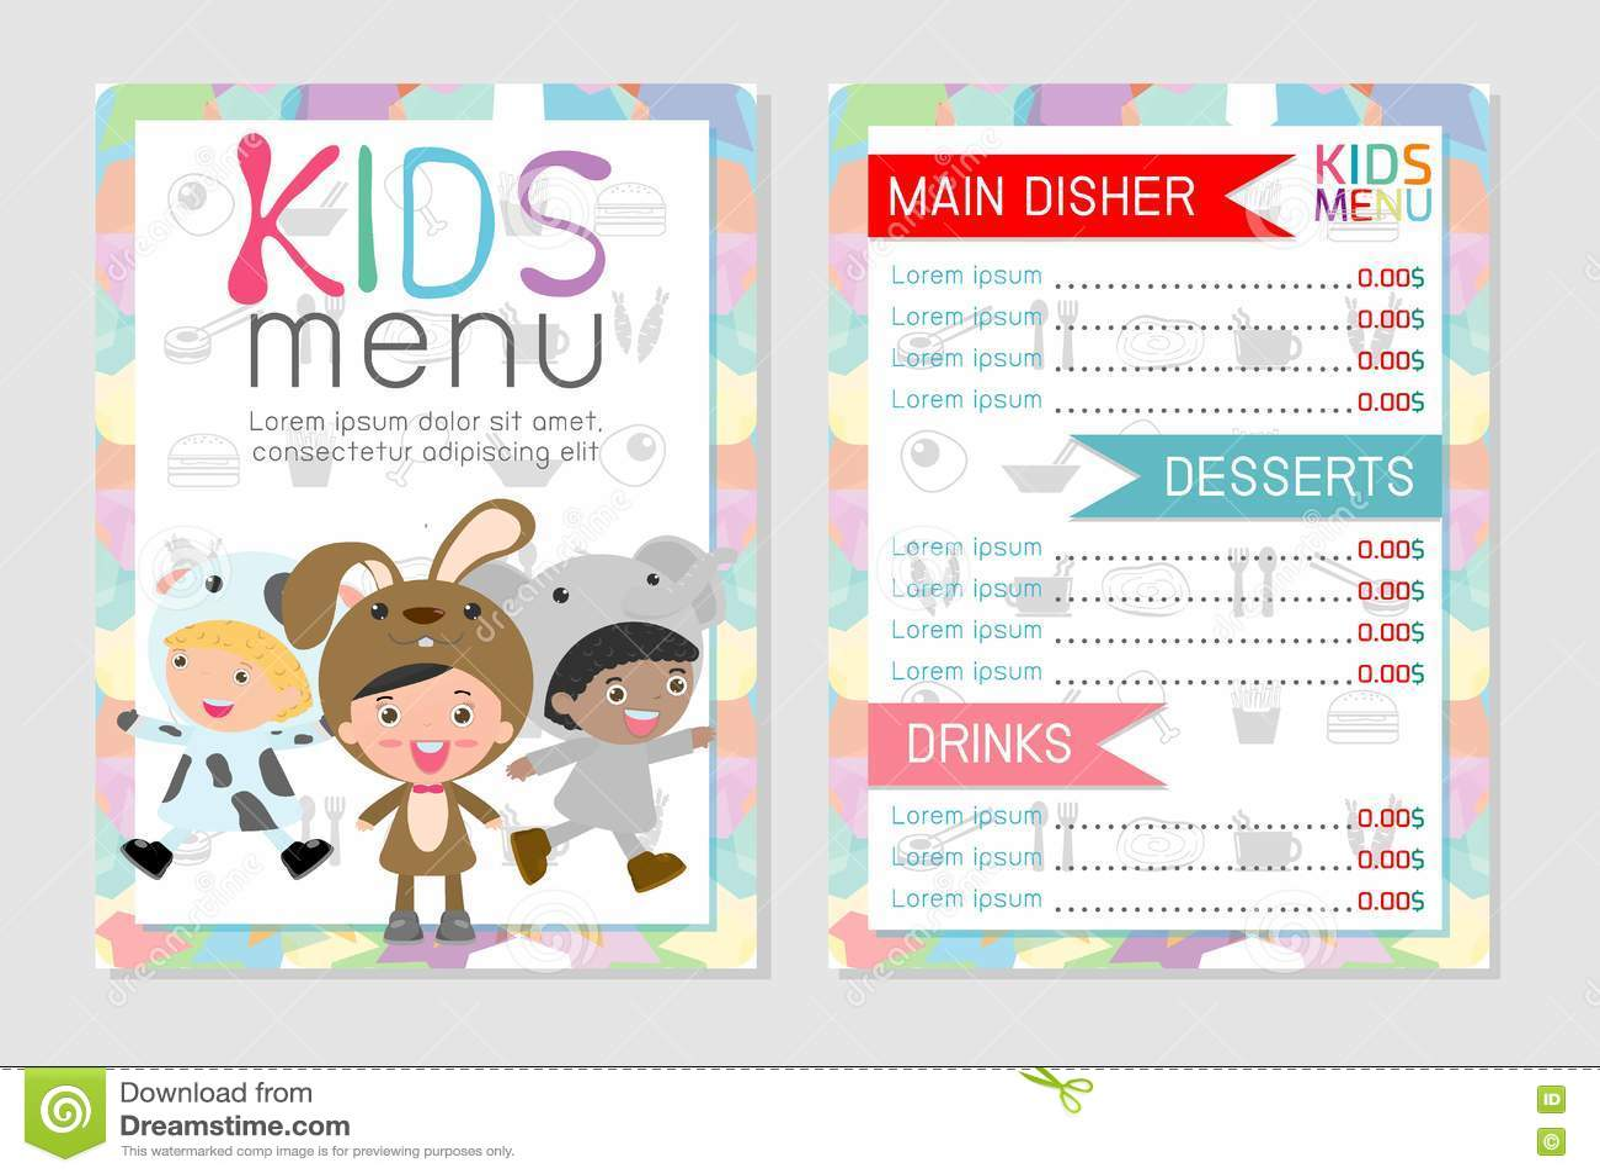 My Chosen Cafe Kids Menu